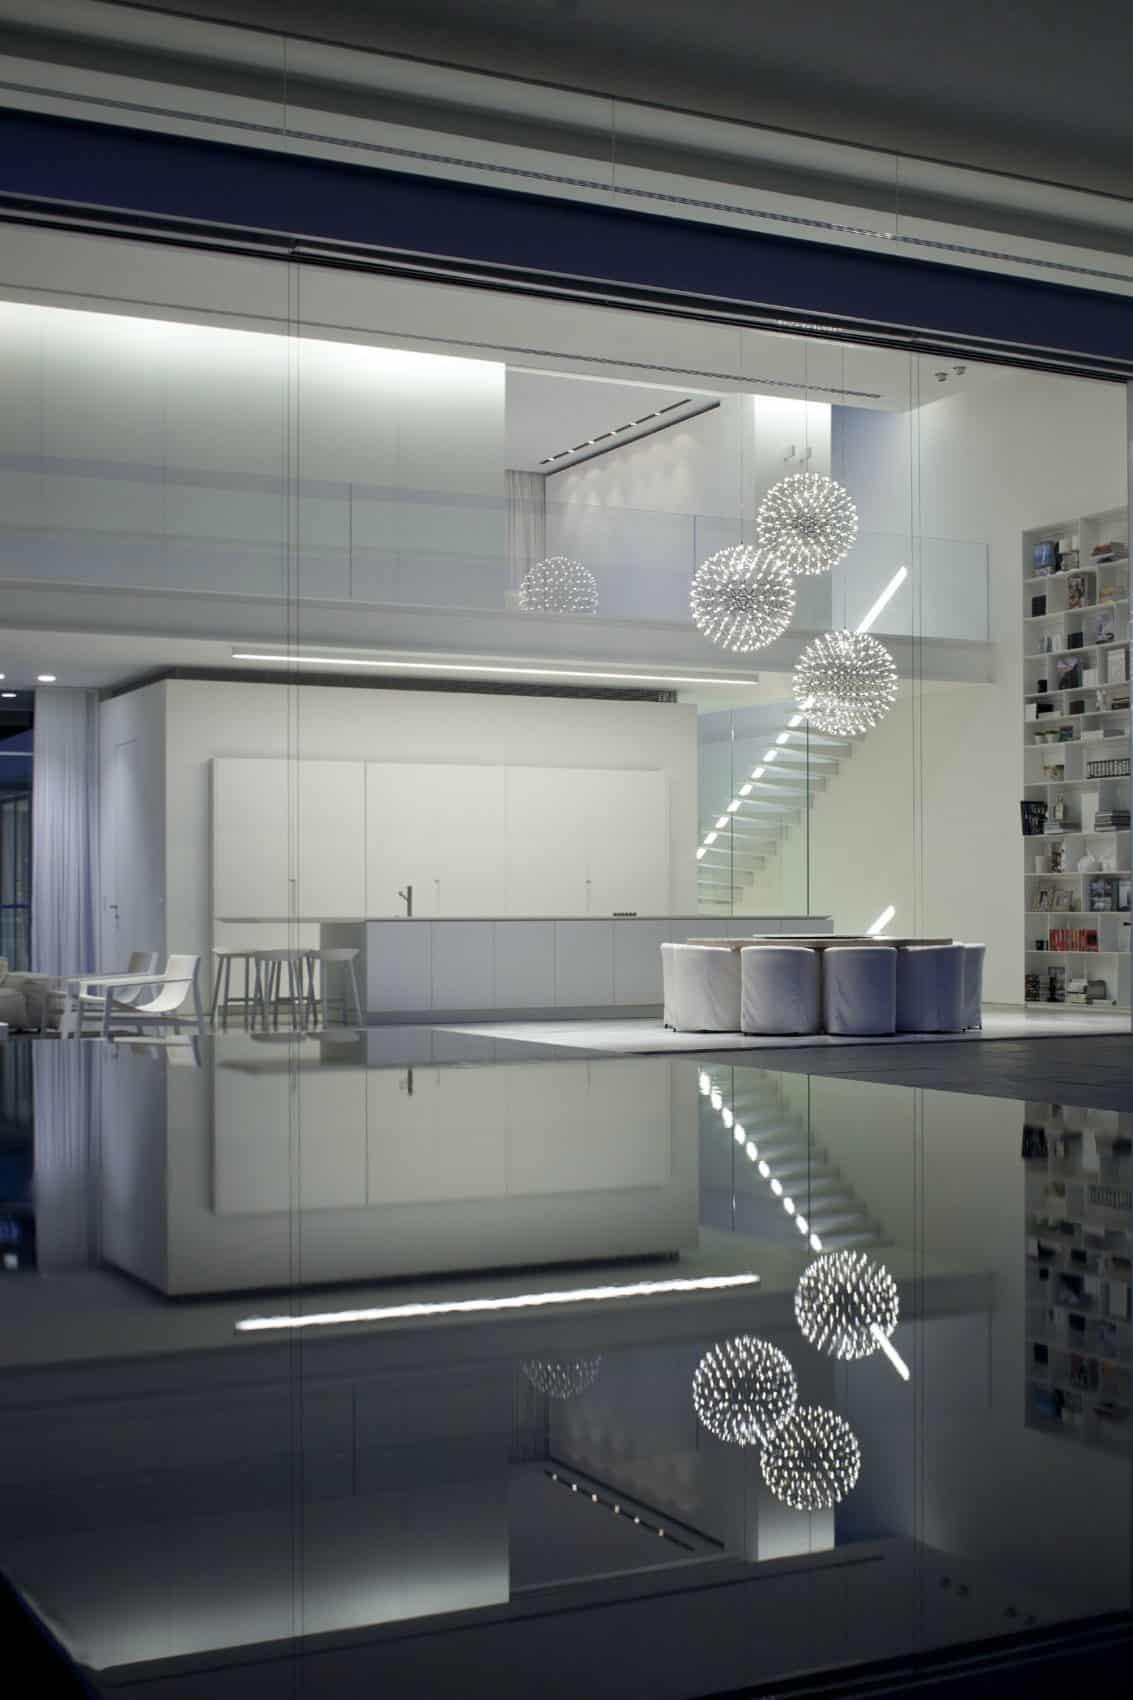 Ramat Hasharon House 13 by Pitsou Kedem Architects (24)